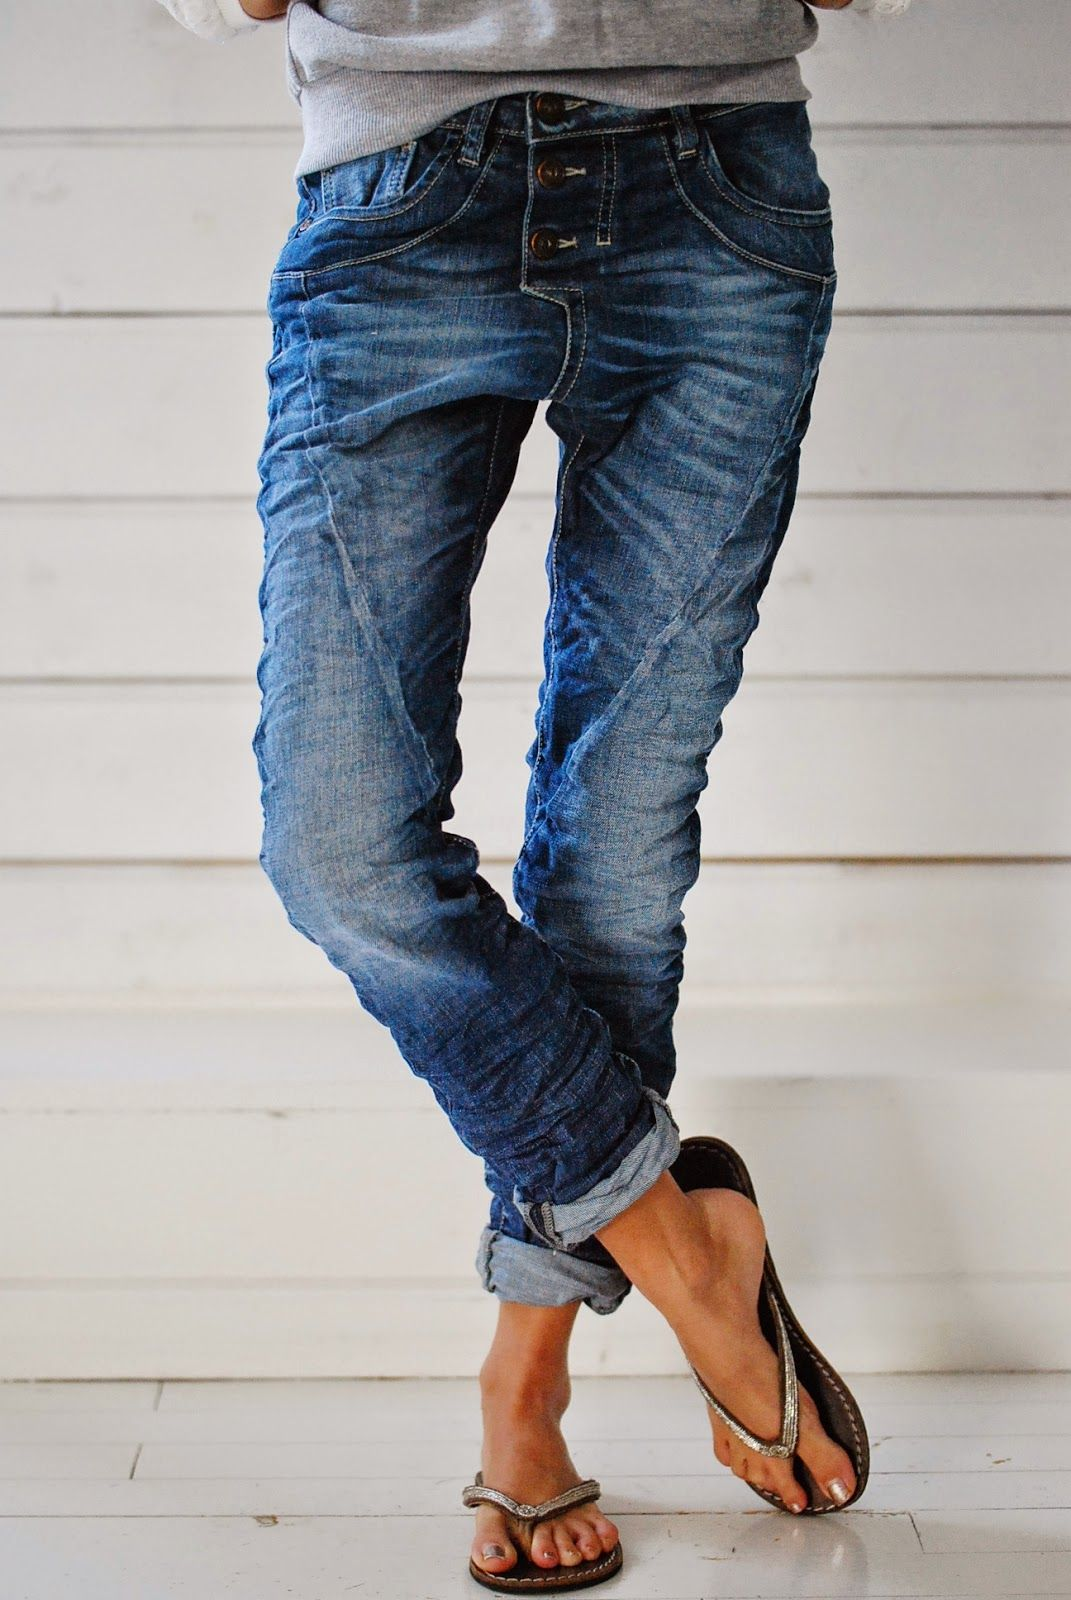 B I S K O P S G Å R D E N | Återvinna jeans, Blåa saker, Kläder